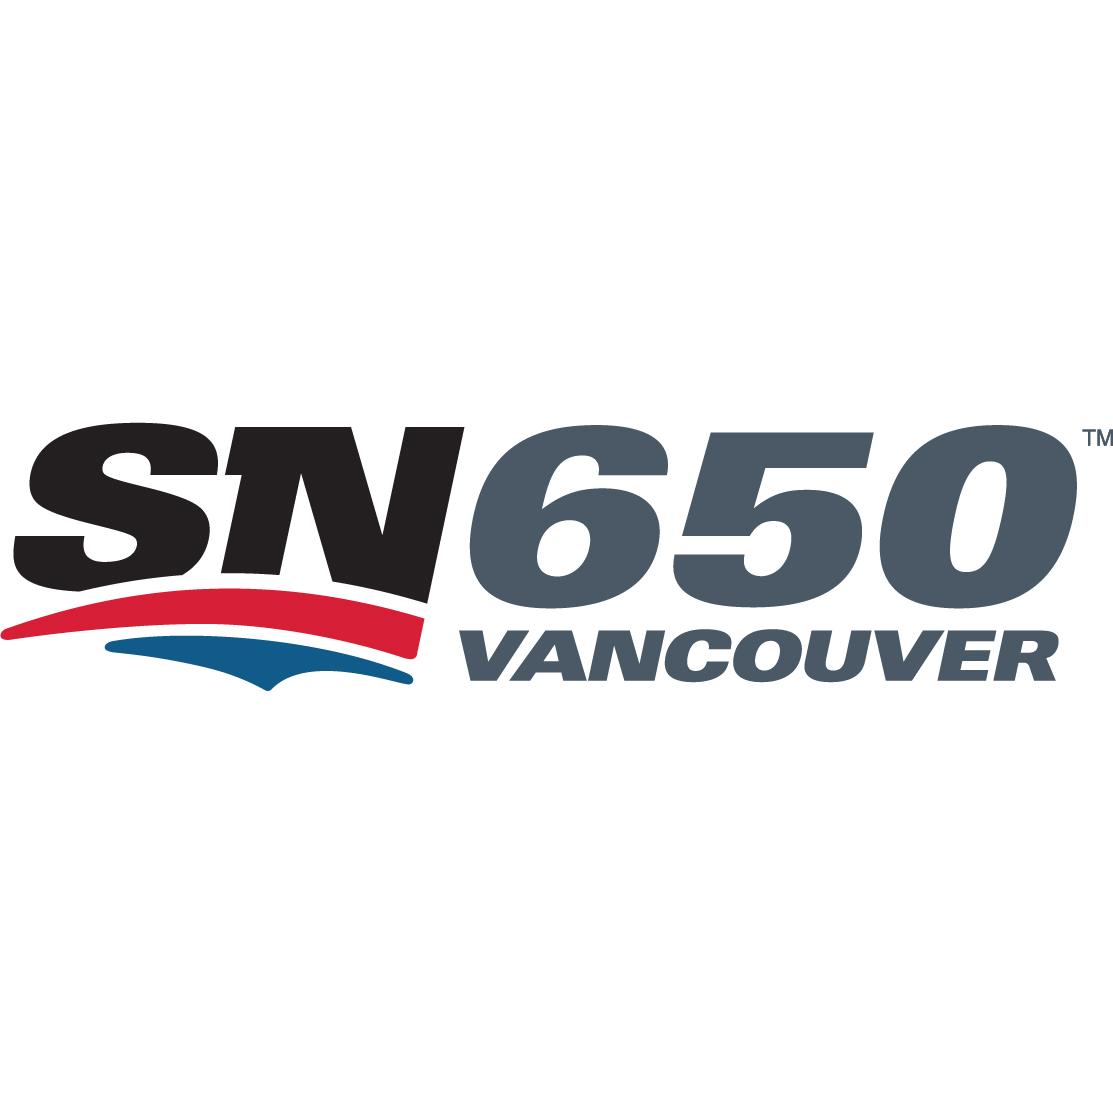 Sn 650 secondary 1